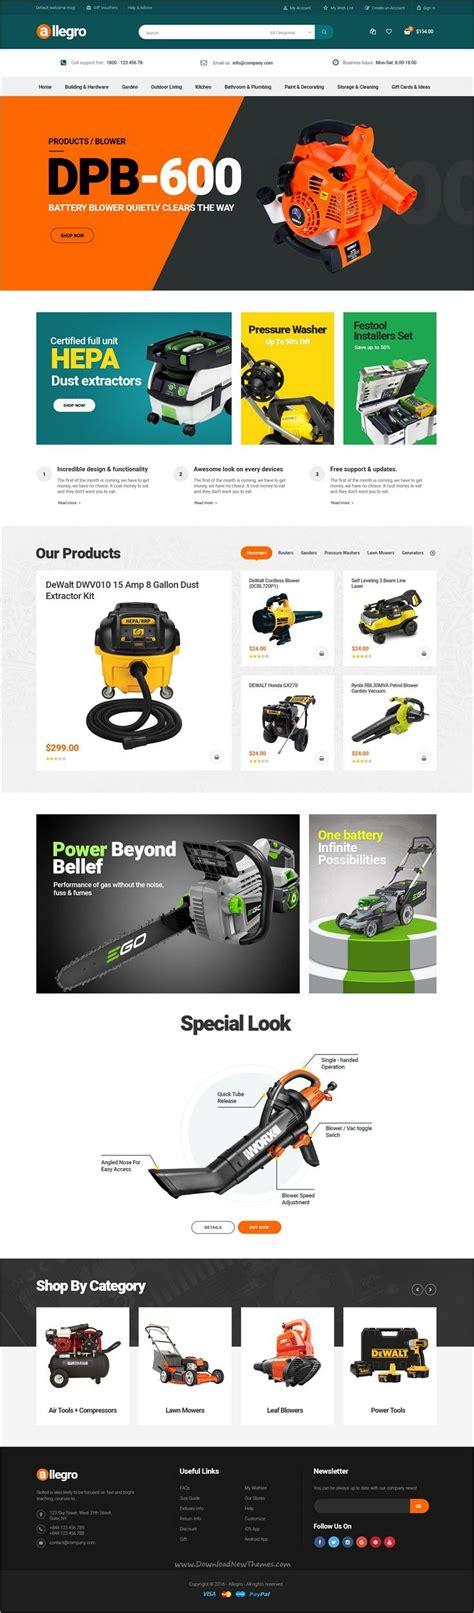 layout design tool website allegro woocommerce wordpress theme for hand tool